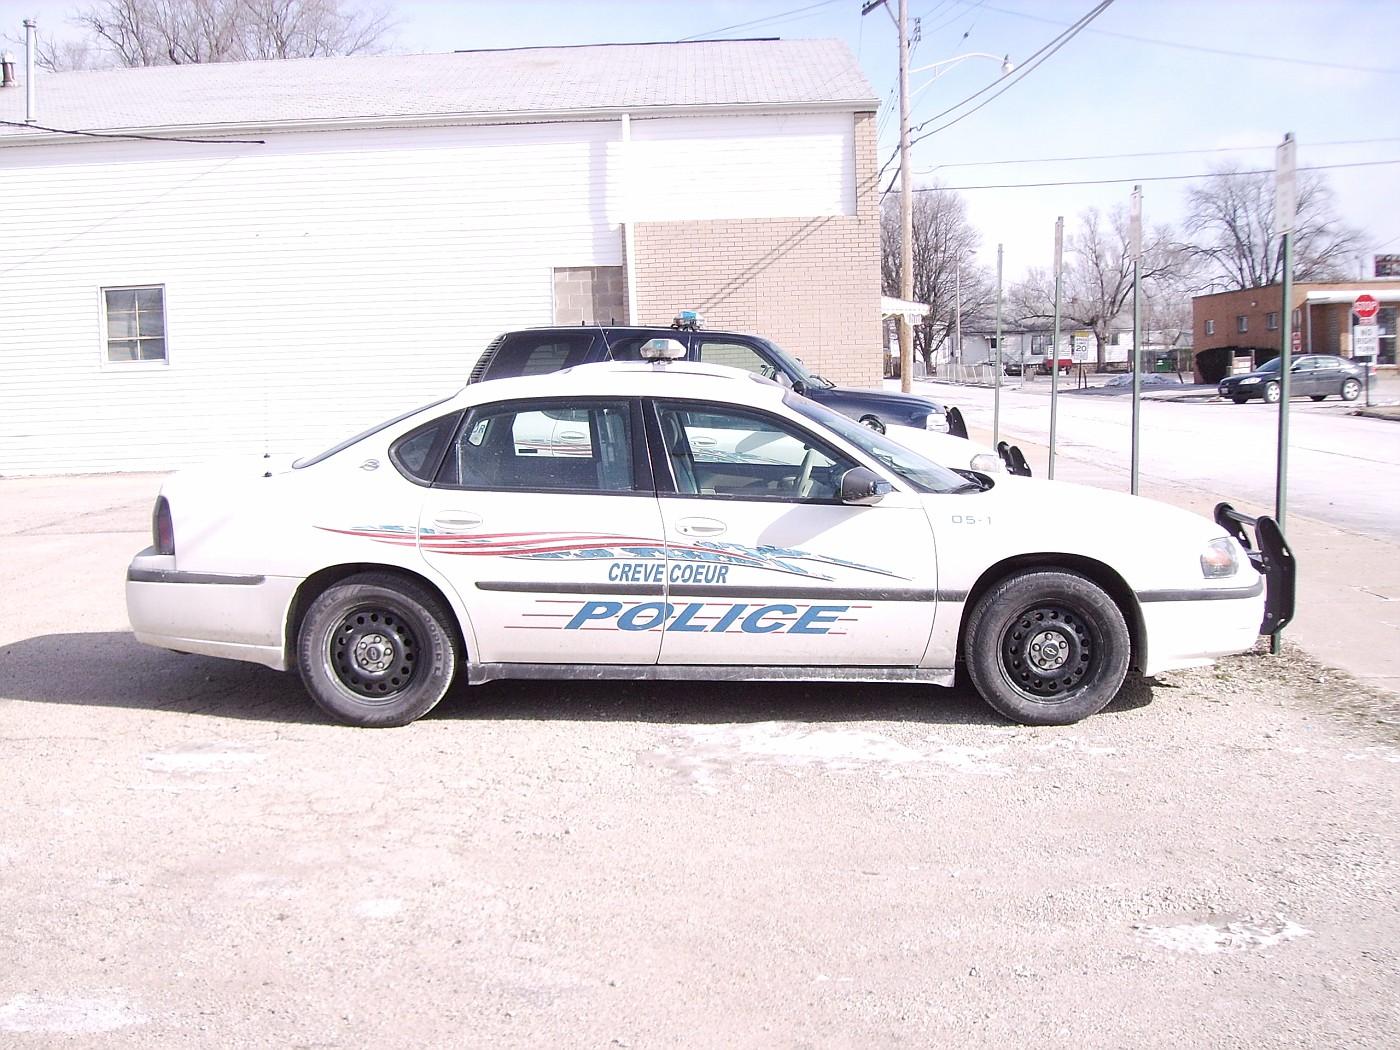 IL - Creve Couer Police